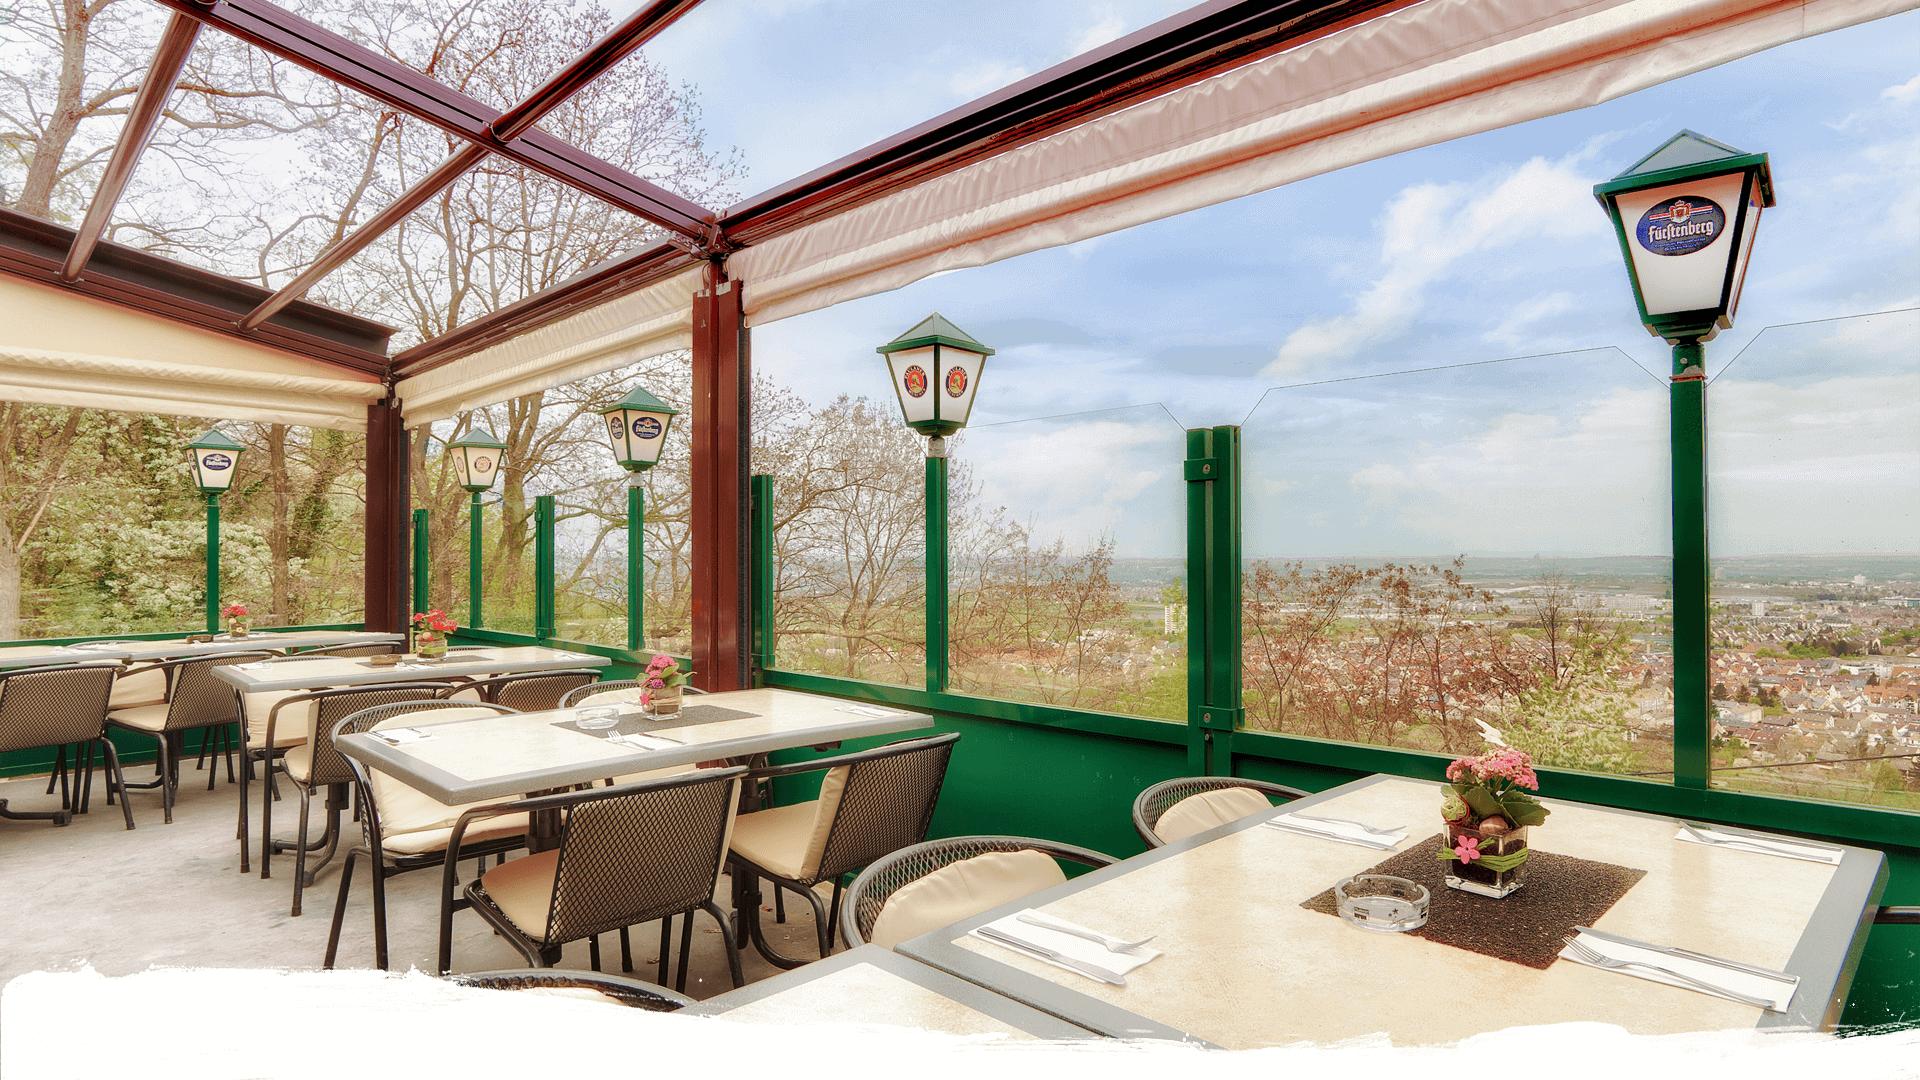 sonnendeck auf dem kappelberg panorama restaurant stuttgart fellbach. Black Bedroom Furniture Sets. Home Design Ideas